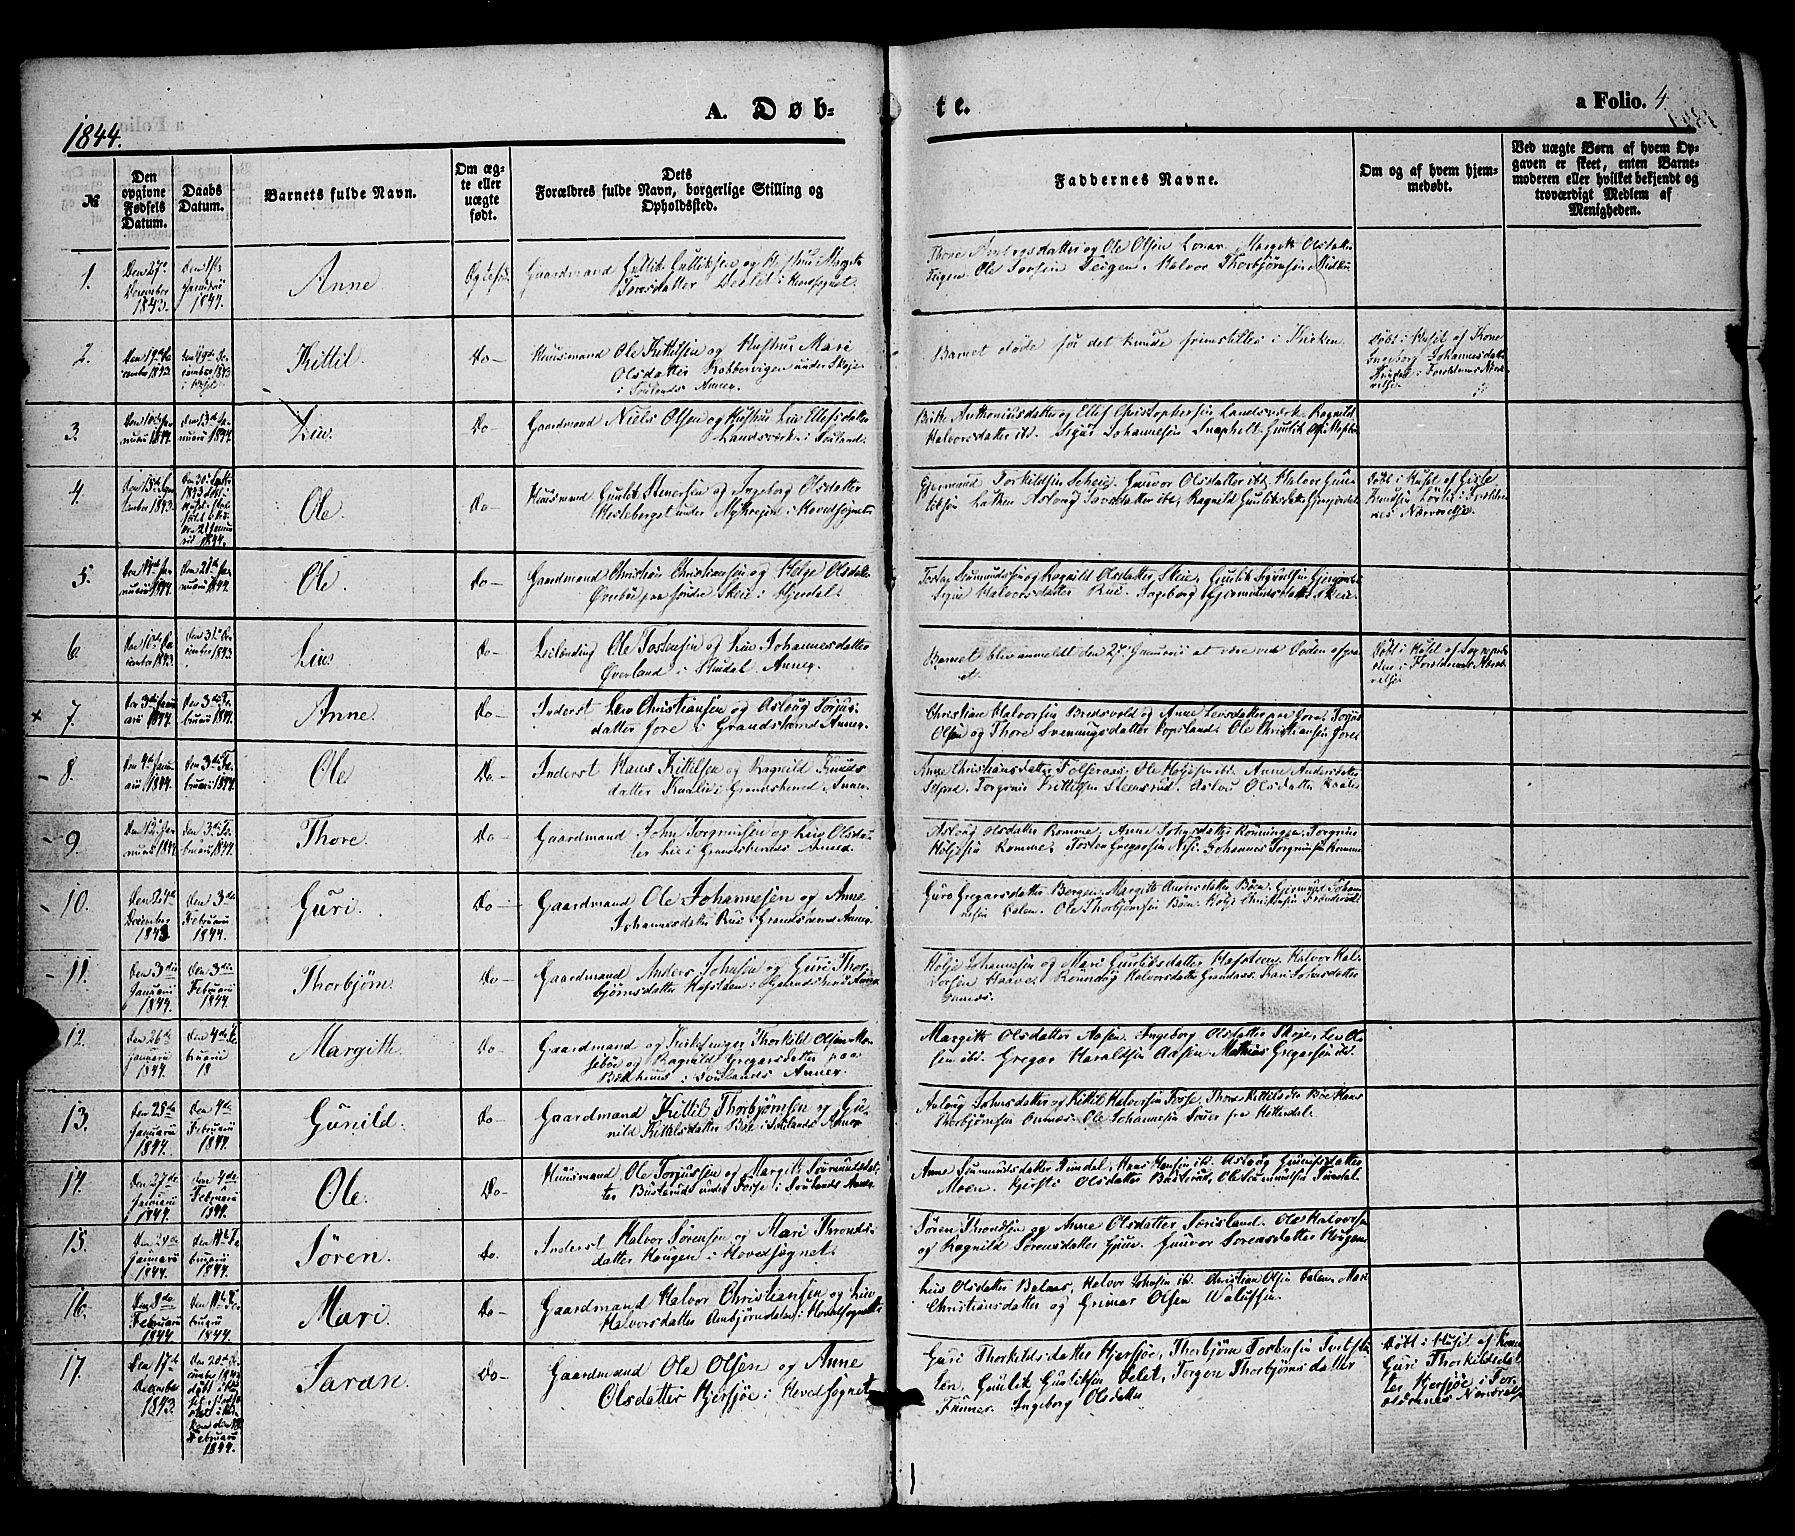 SAKO, Hjartdal kirkebøker, F/Fa/L0008: Ministerialbok nr. I 8, 1844-1859, s. 4